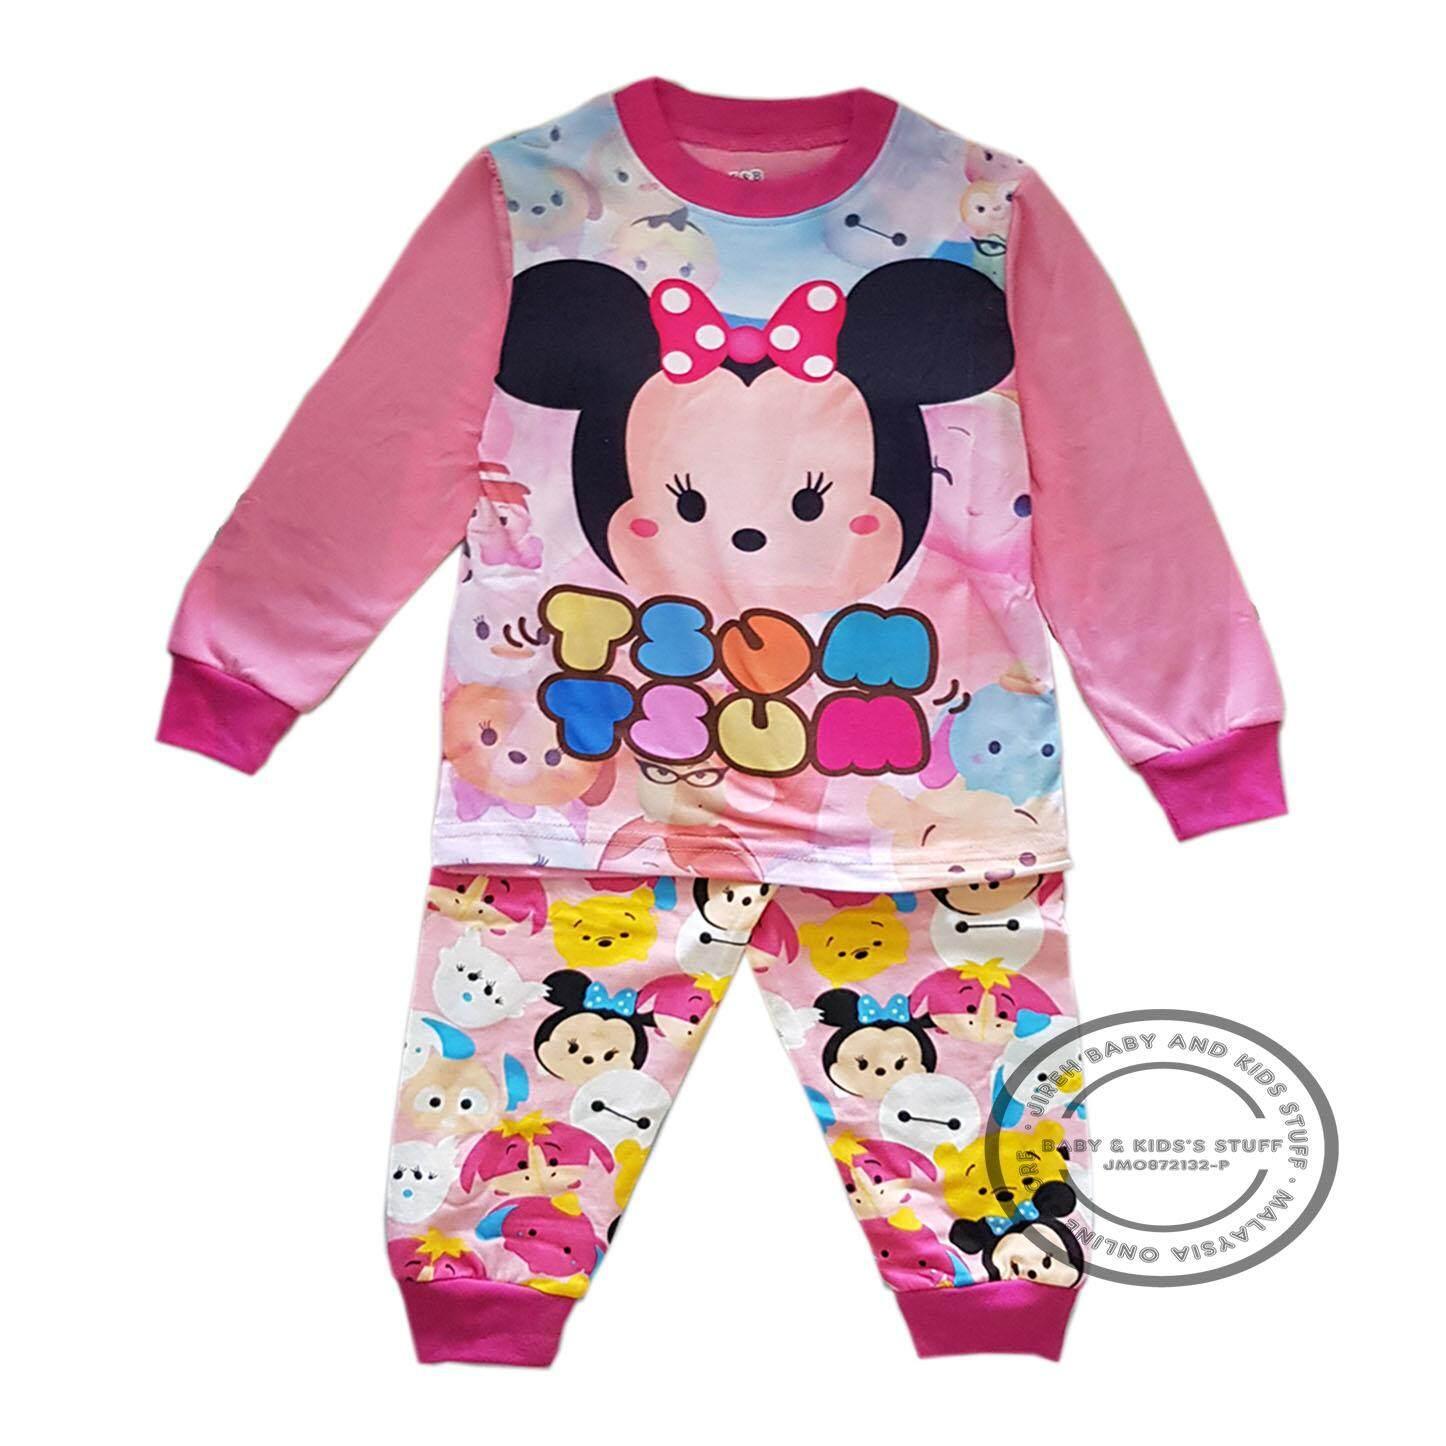 e44d69d00353 Girls  Clothing - Underwear   Sleepwear - Buy Girls  Clothing ...